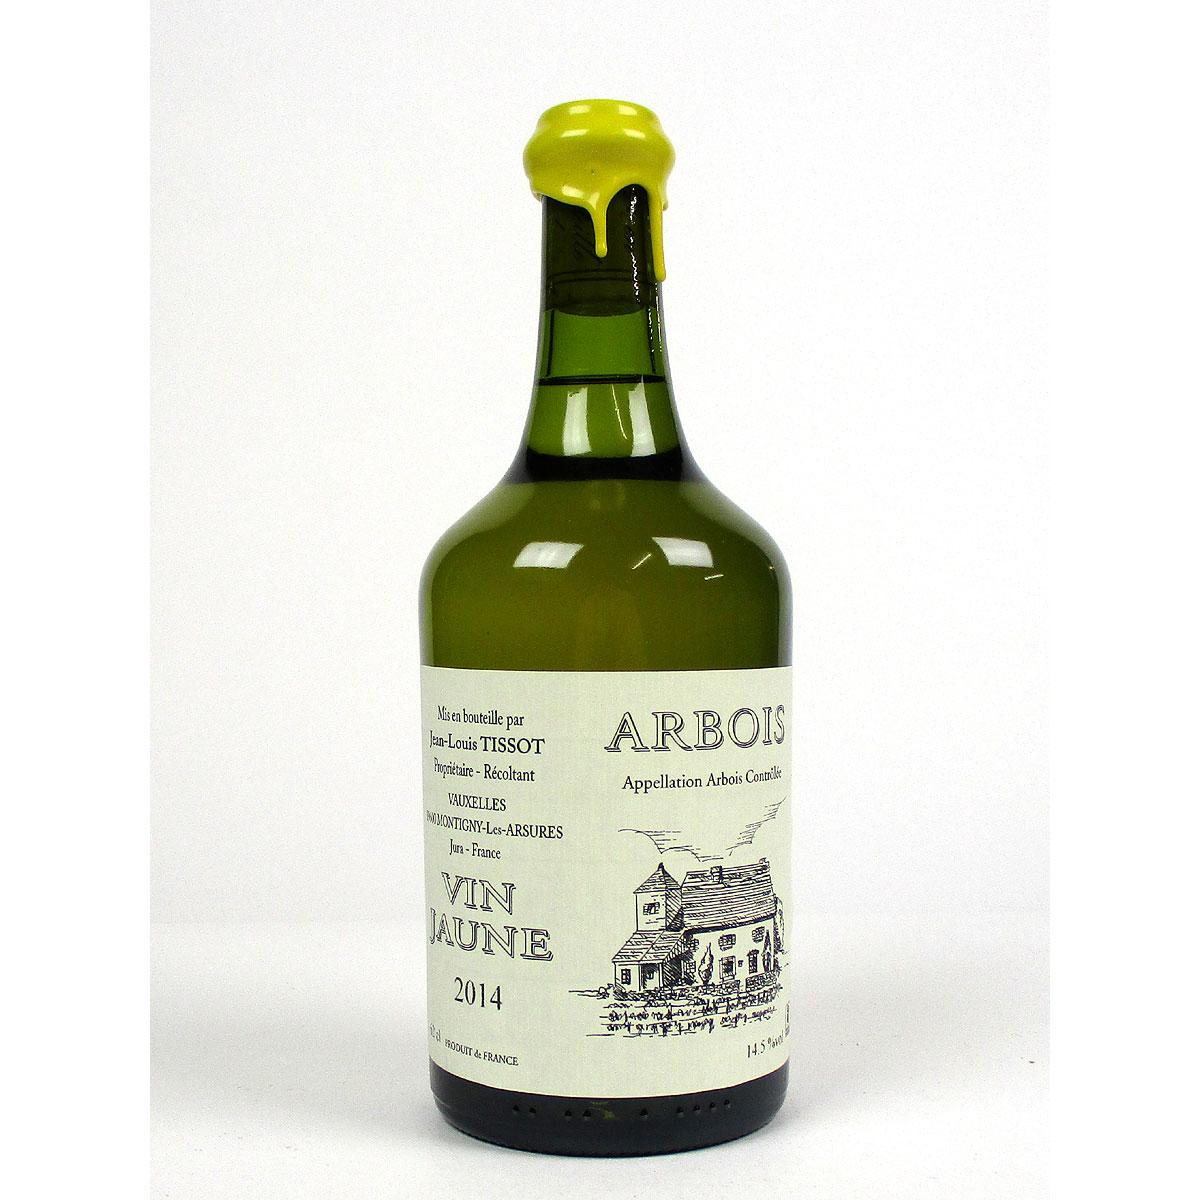 Jura Arbois: Vin Jaune Domaine Jean-Louis Tissot 2014 - Bottle